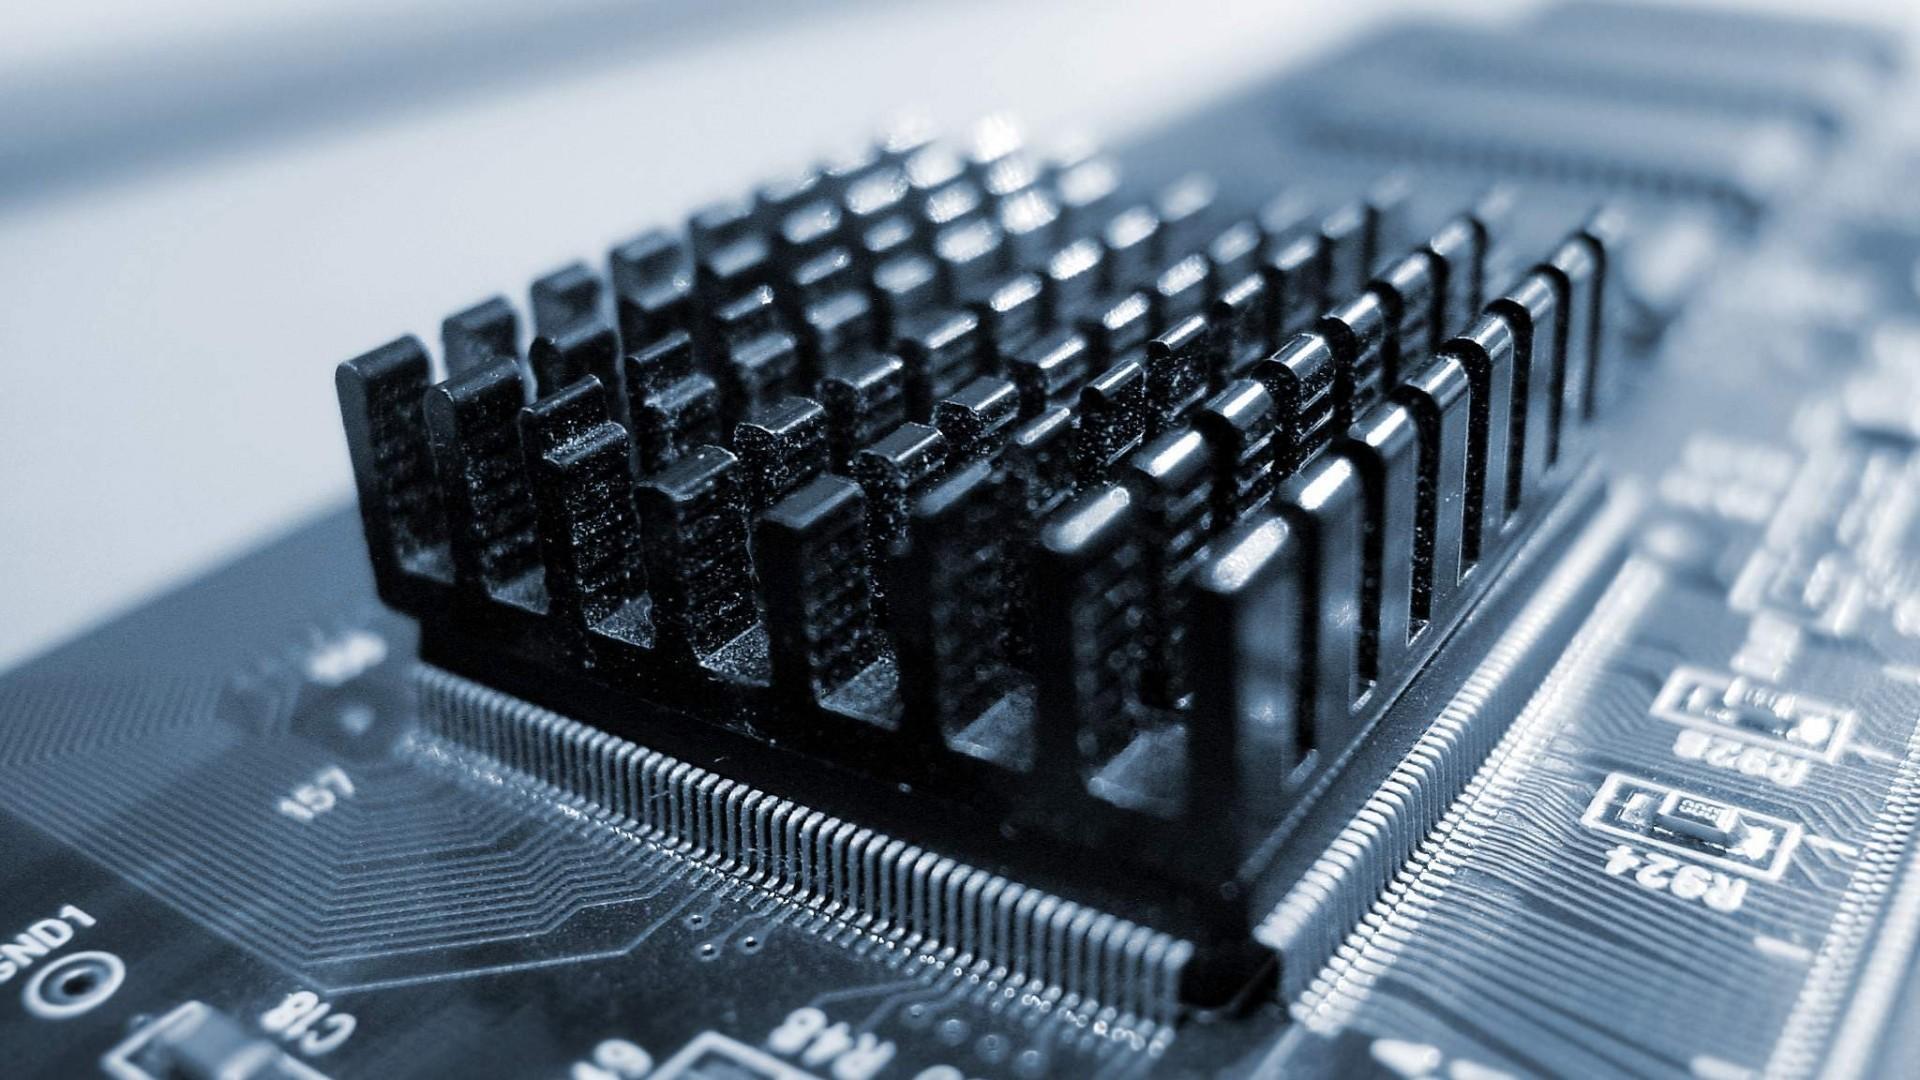 Res: 1920x1080, radiator, black, chip